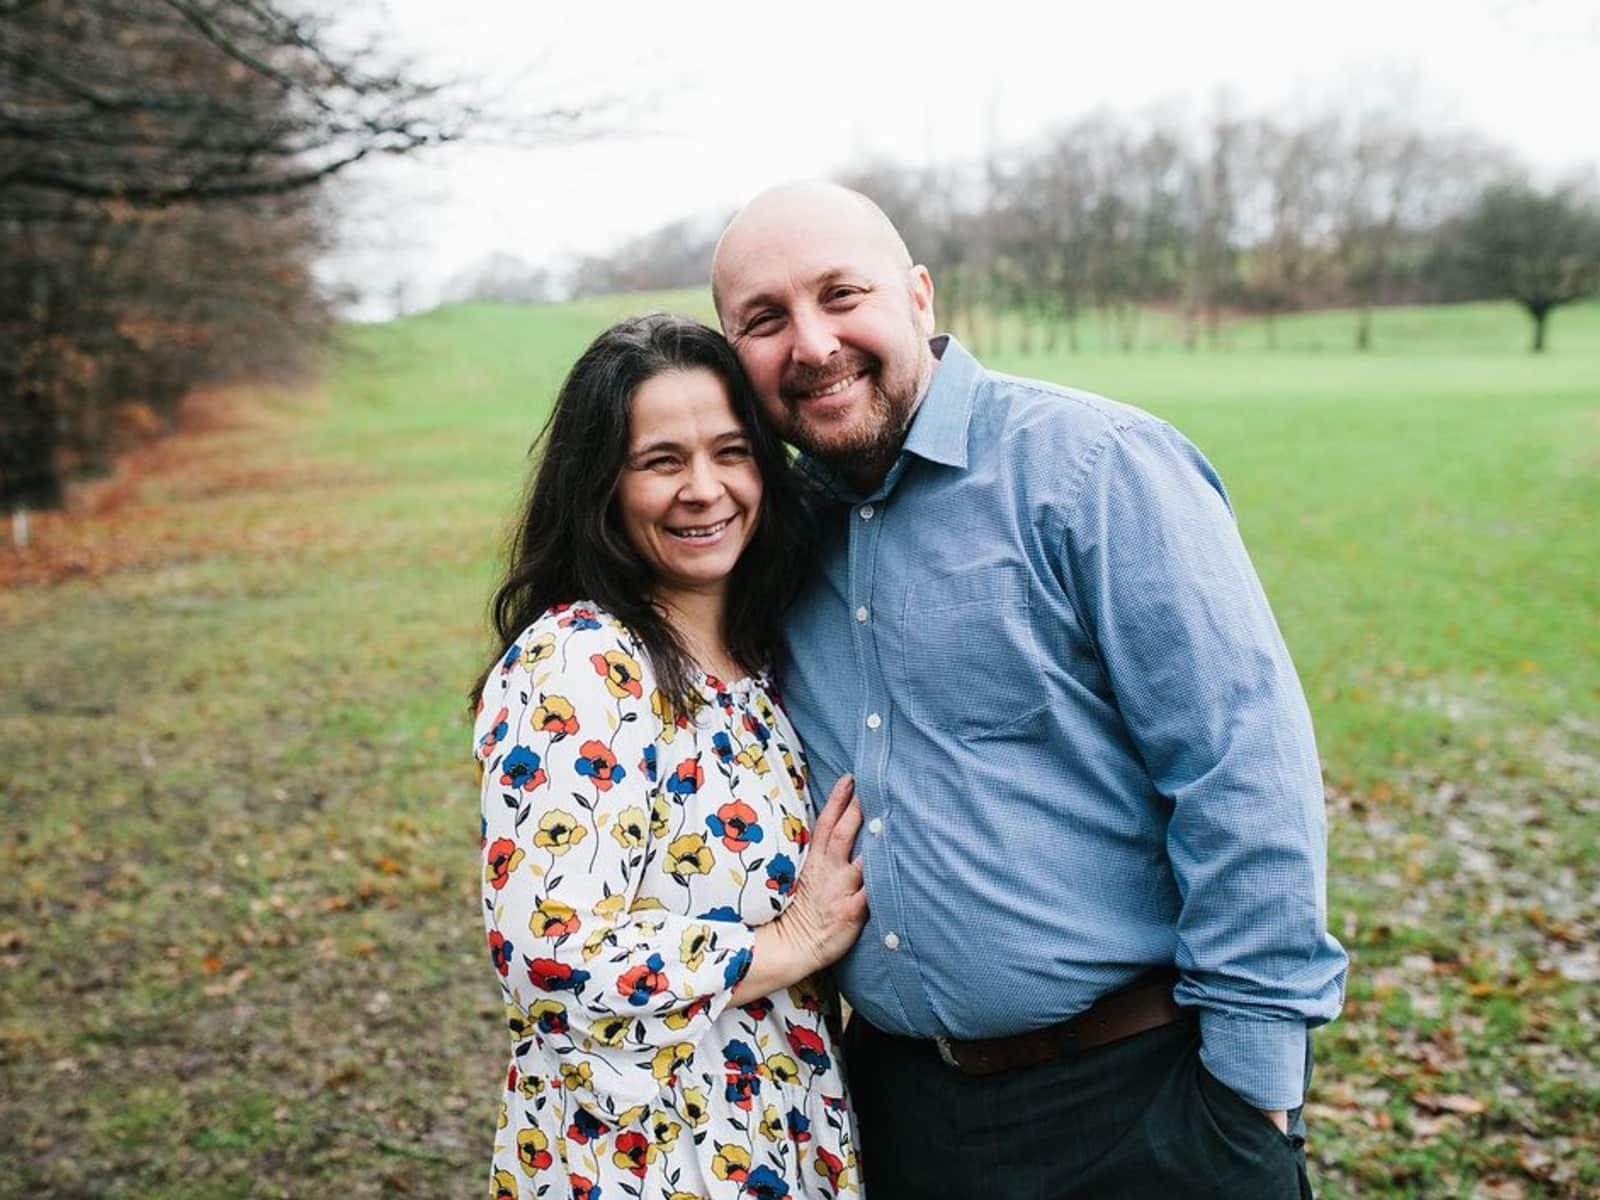 Ruth & Kieron from Manchester City Centre, United Kingdom